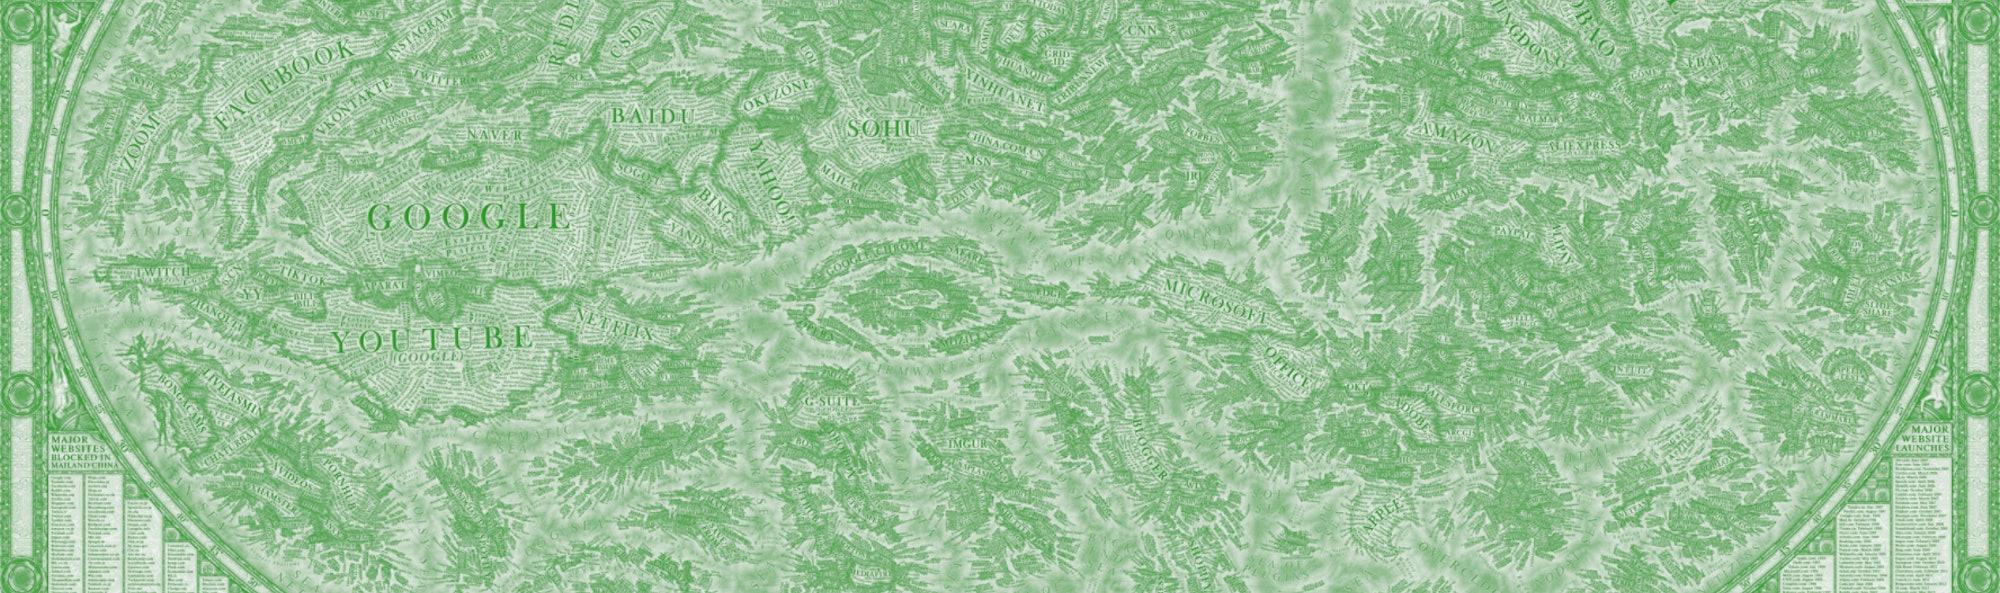 World map of the internet by Martin Vargic. Data visualization. Art. Data viz. Graphic design. Carto...